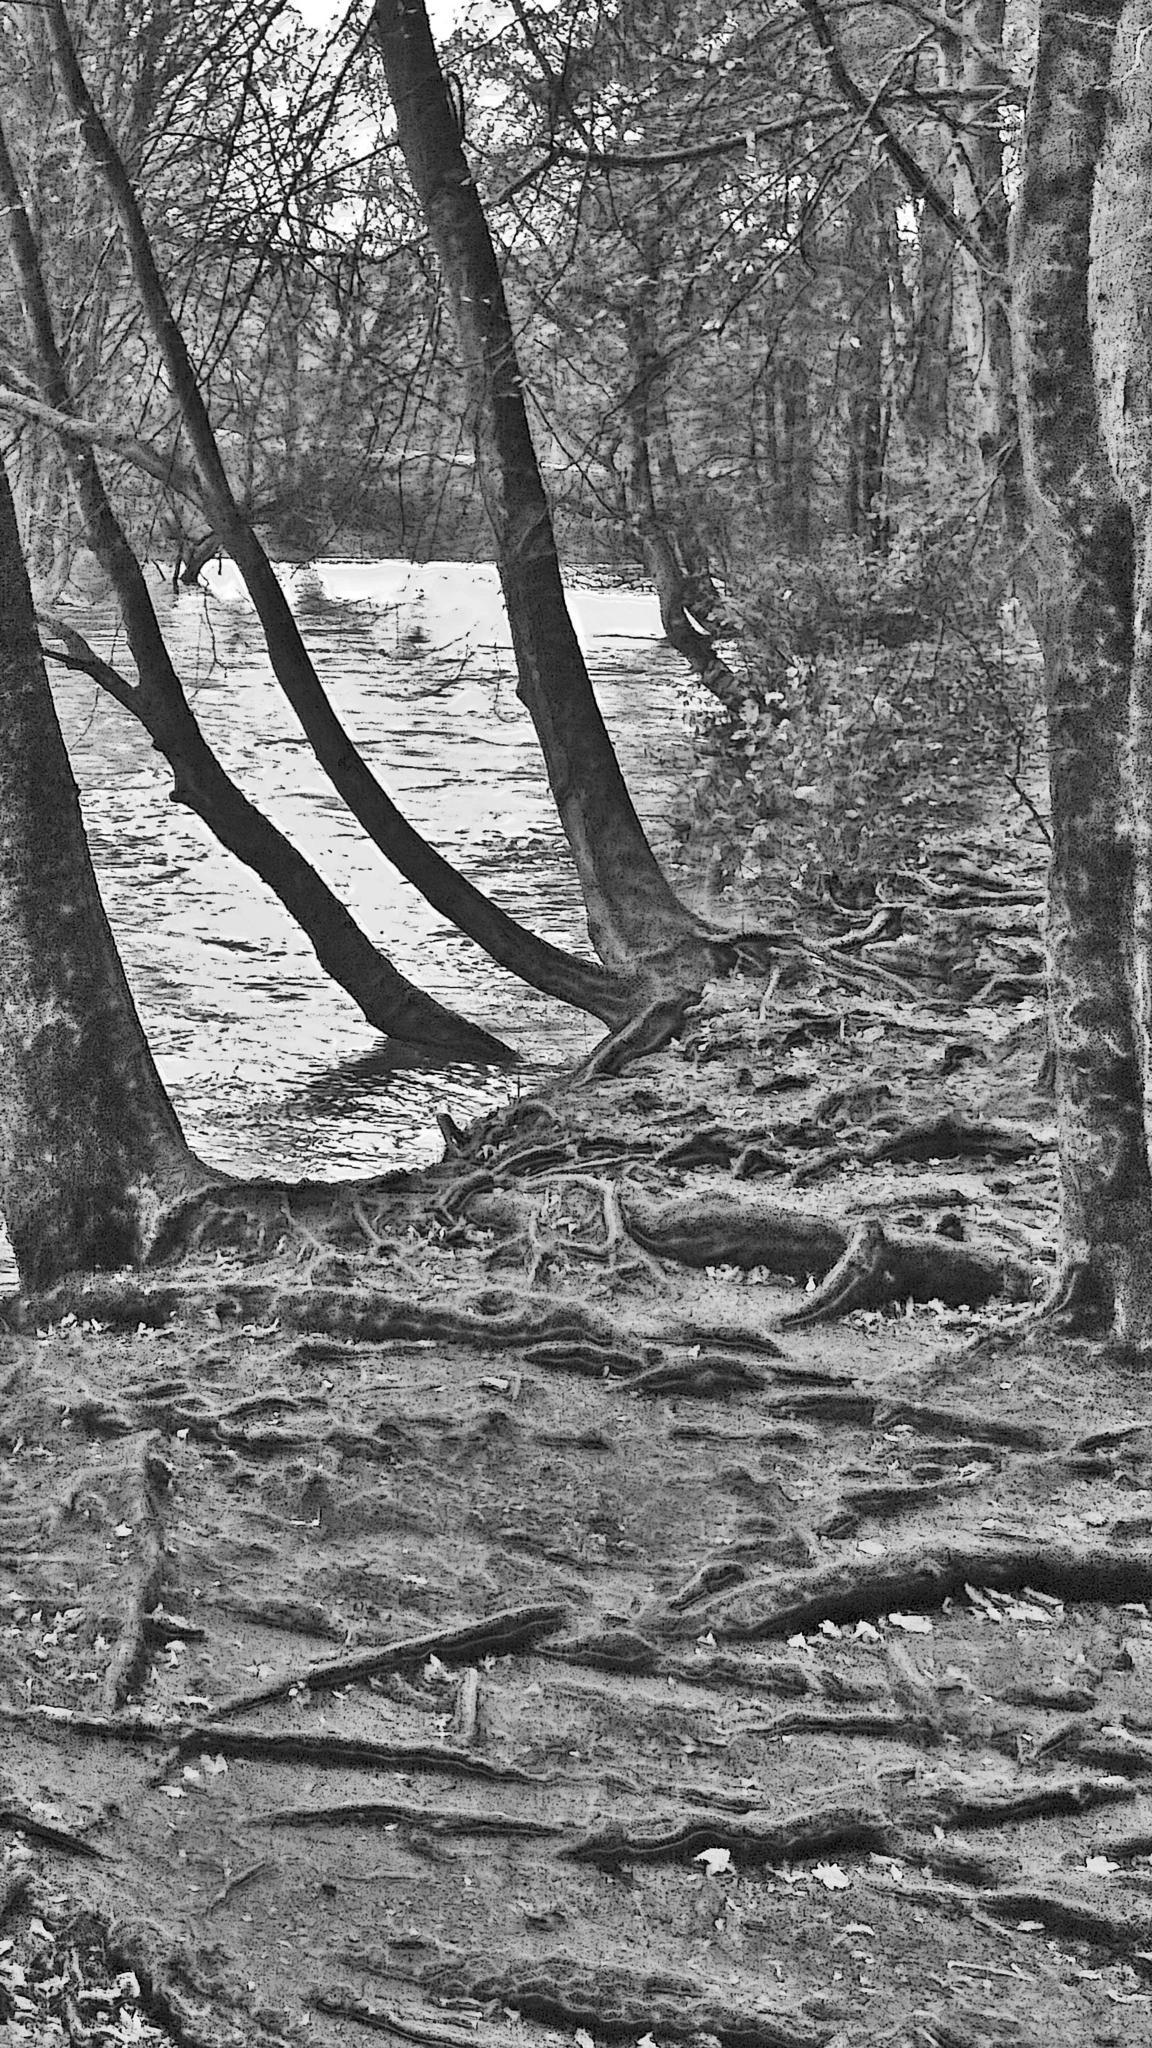 riverbank and roots of trees by sreten nakićenović